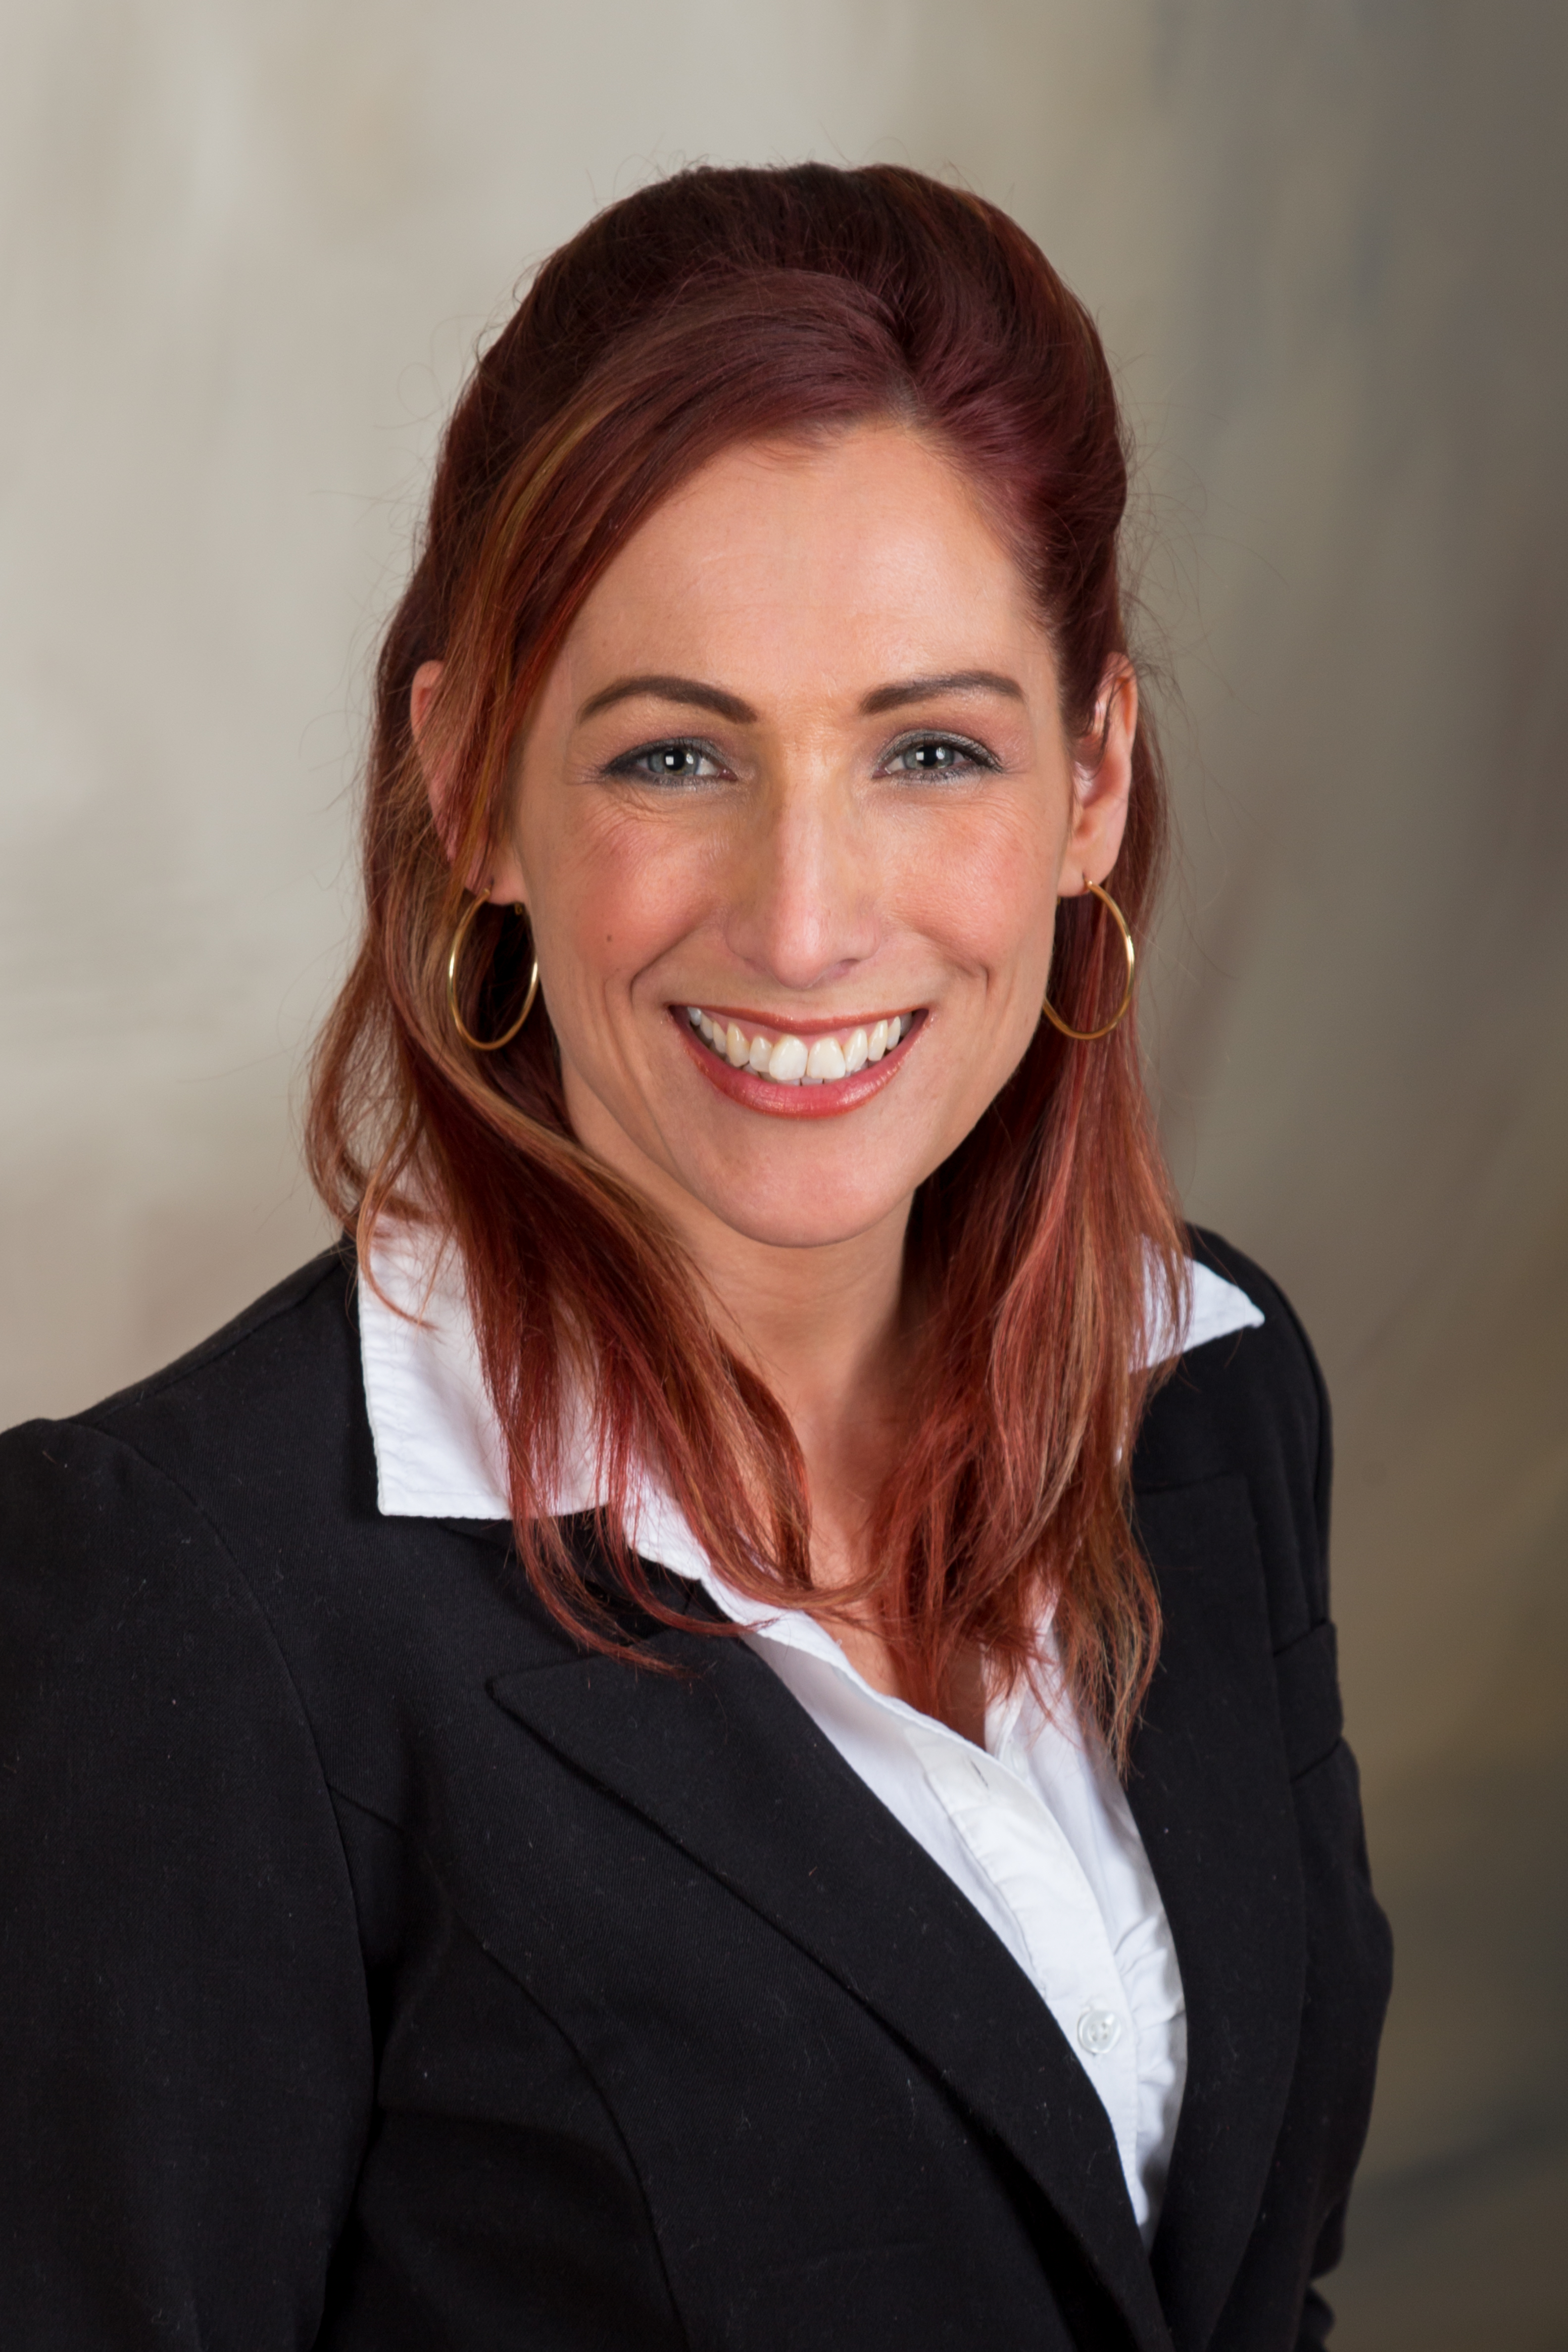 Introducing our newest agent! Stephanie Wallenstein!